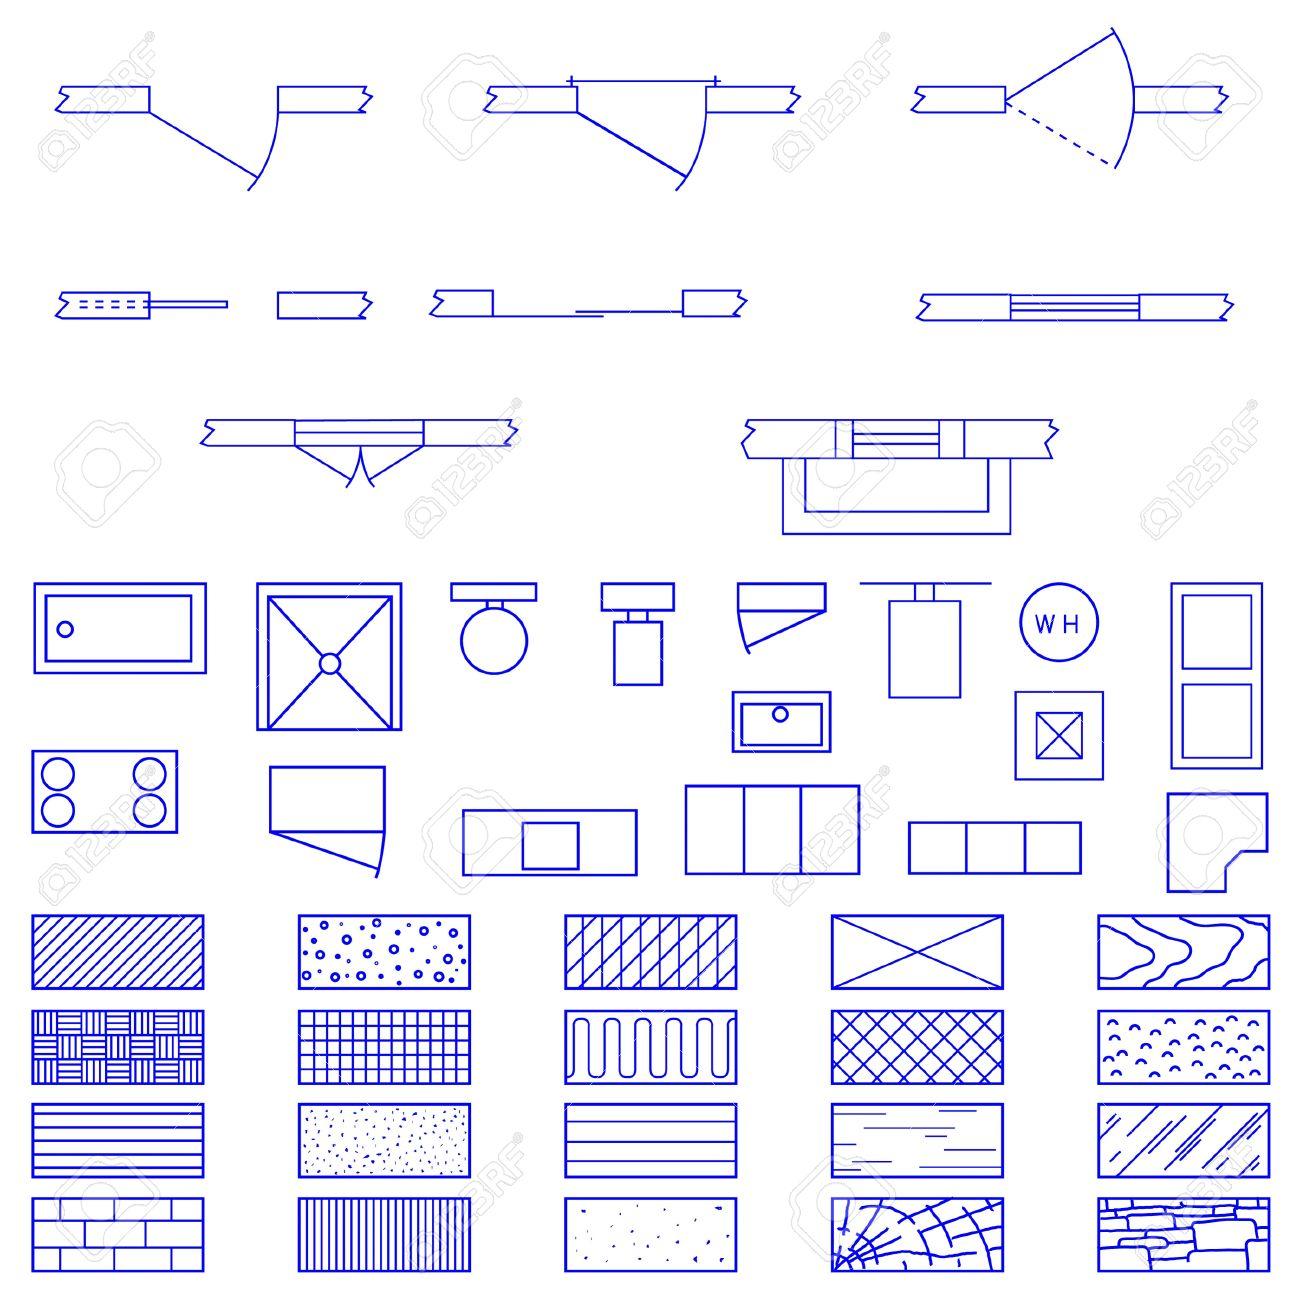 complete set of blueprint icons and symbols usedarchitects